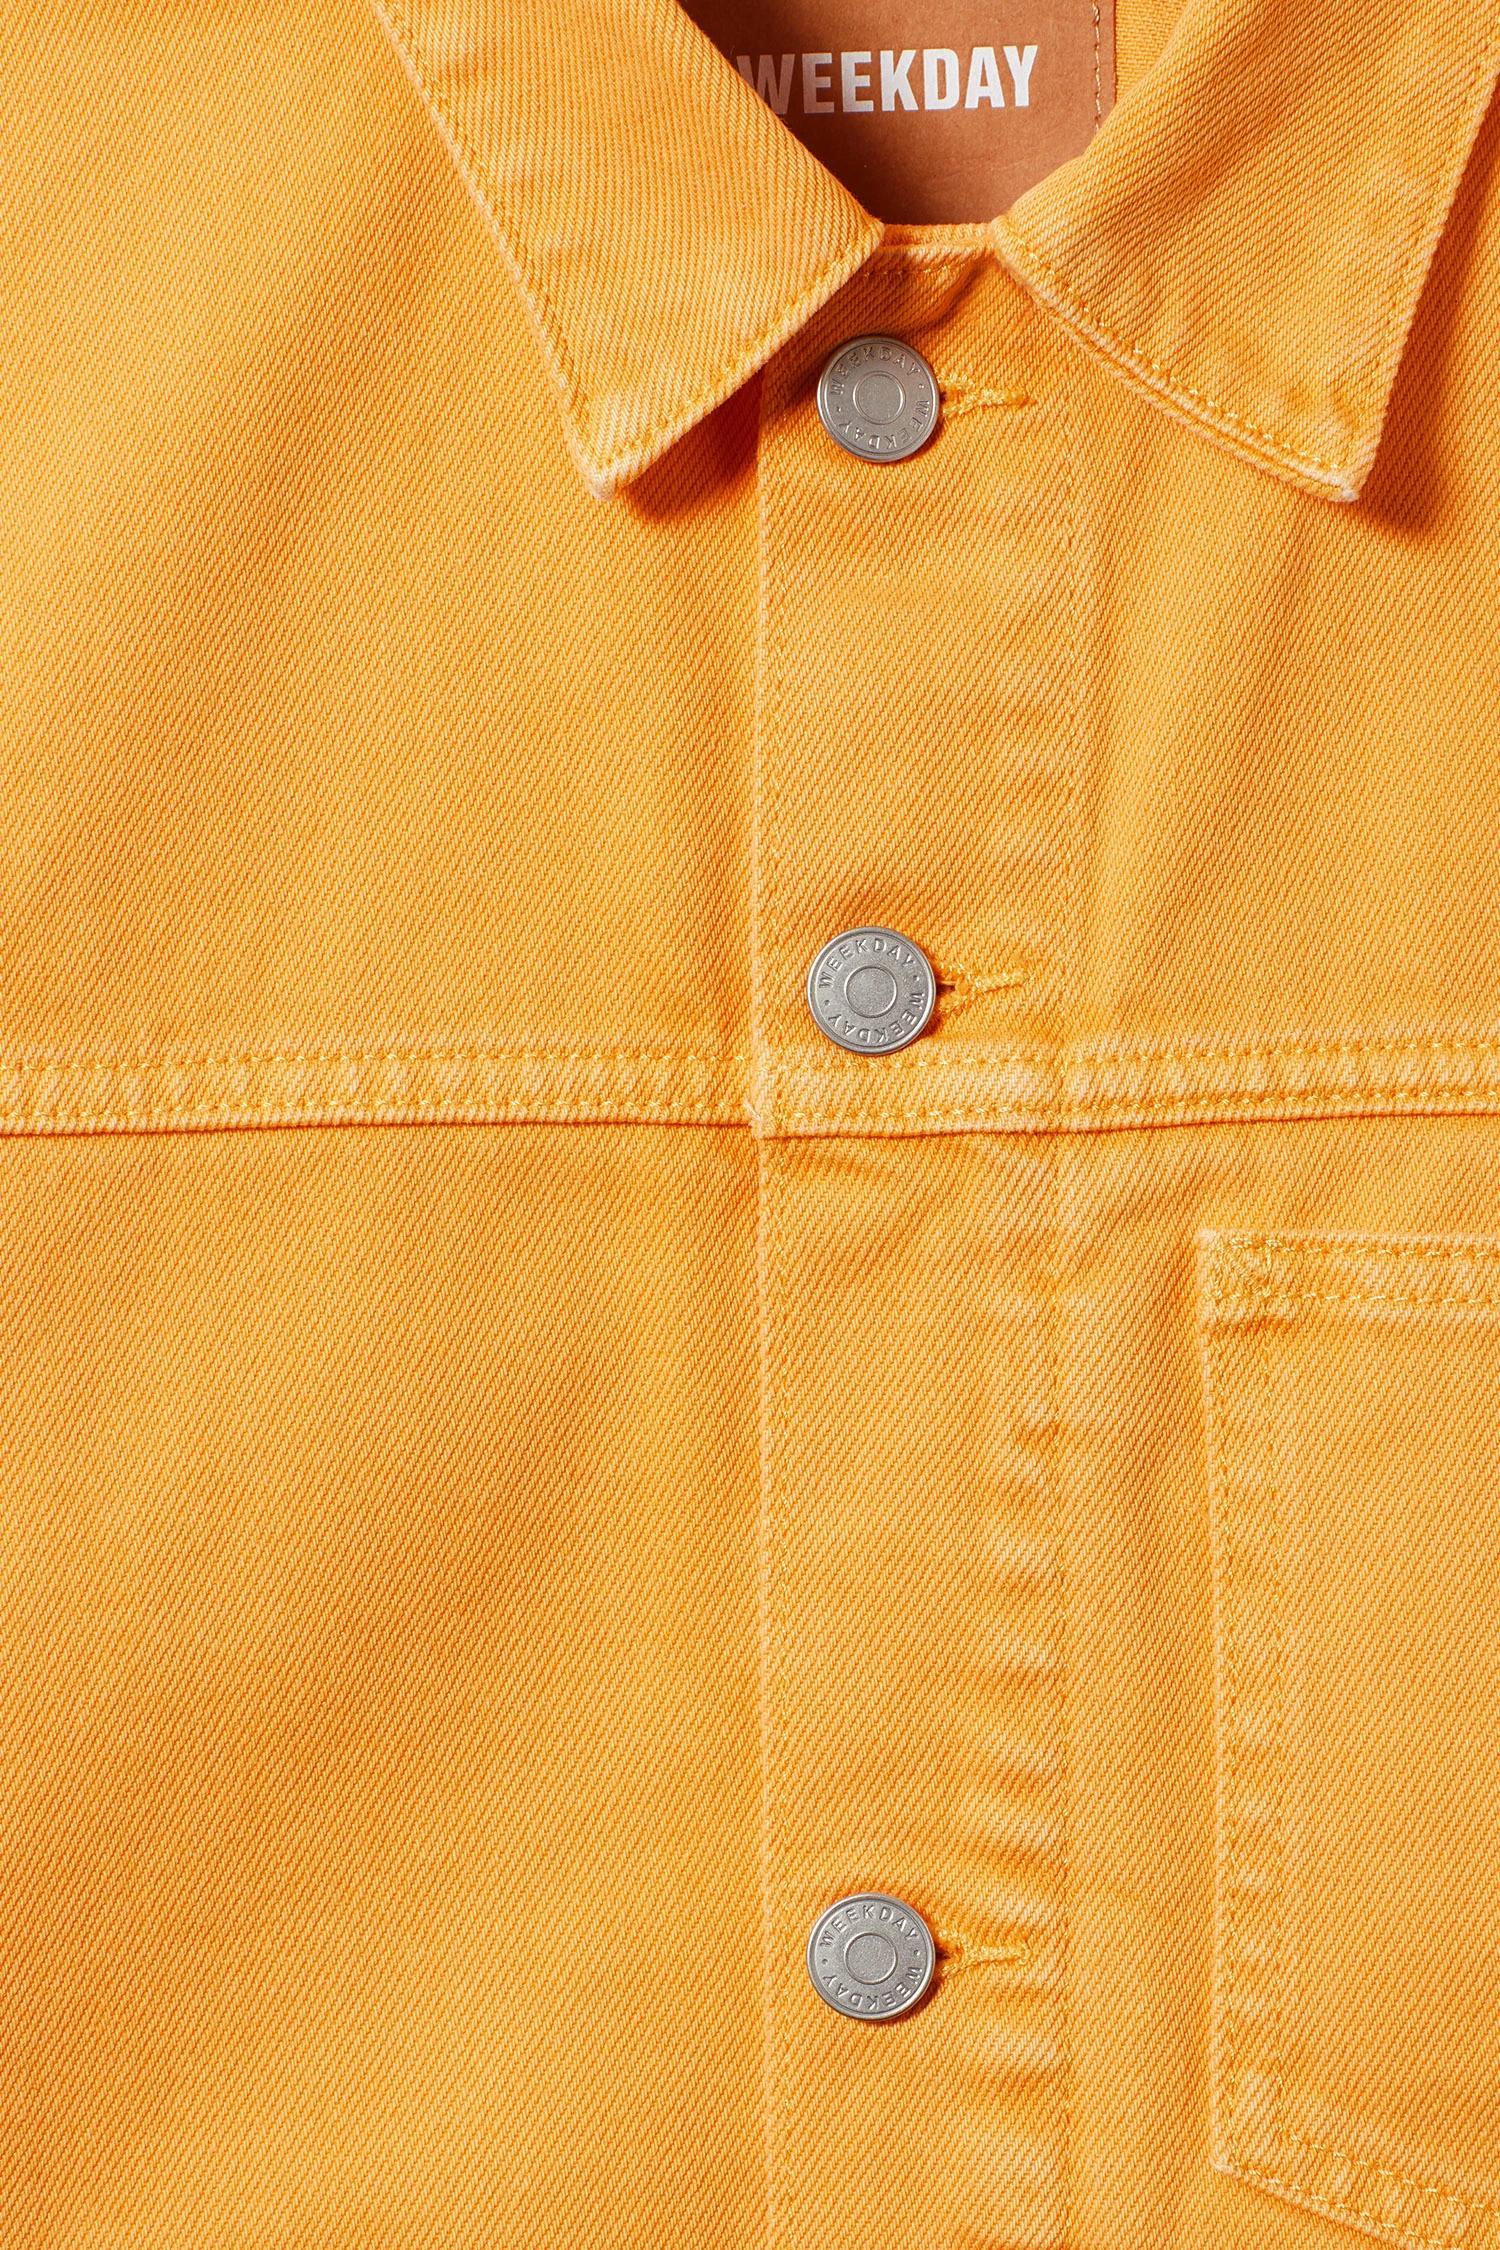 Weekday Denim Core Yellow Jacket for Men